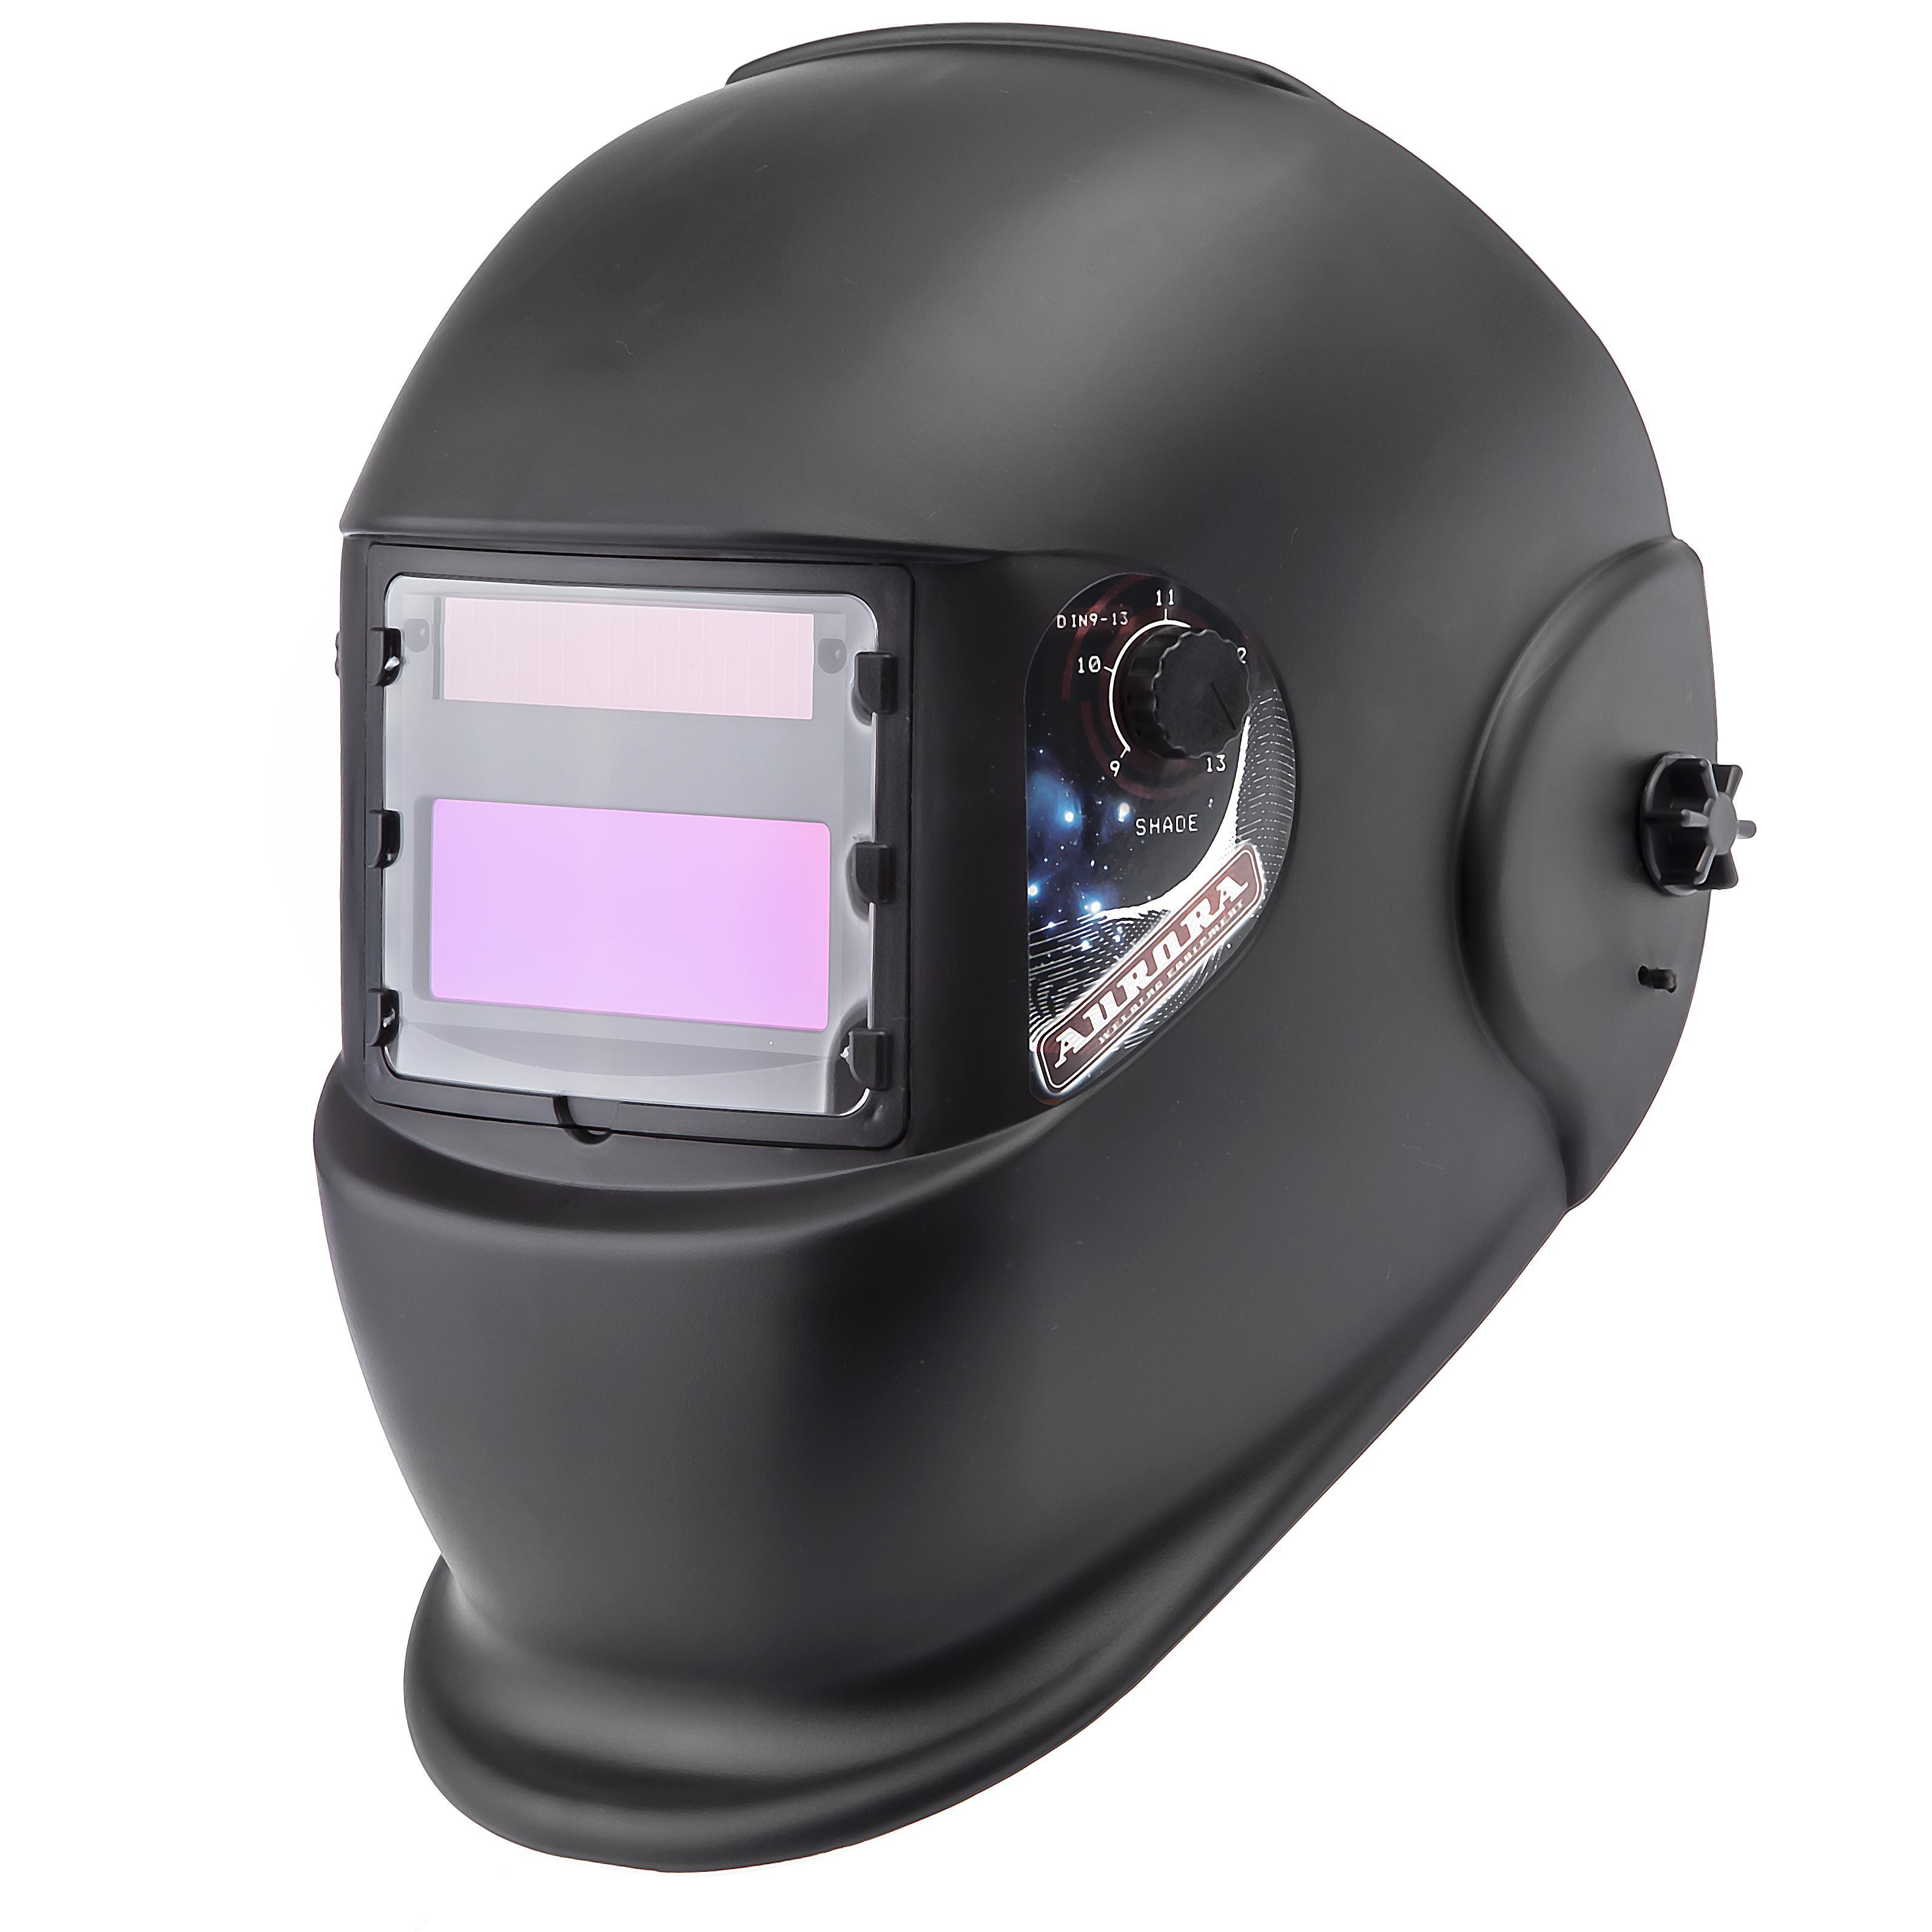 Маска сварщика хамелеон Aurora A998f(9-13din) black cosmo маска сварщика aurora хамелеон sun7 chain 14724